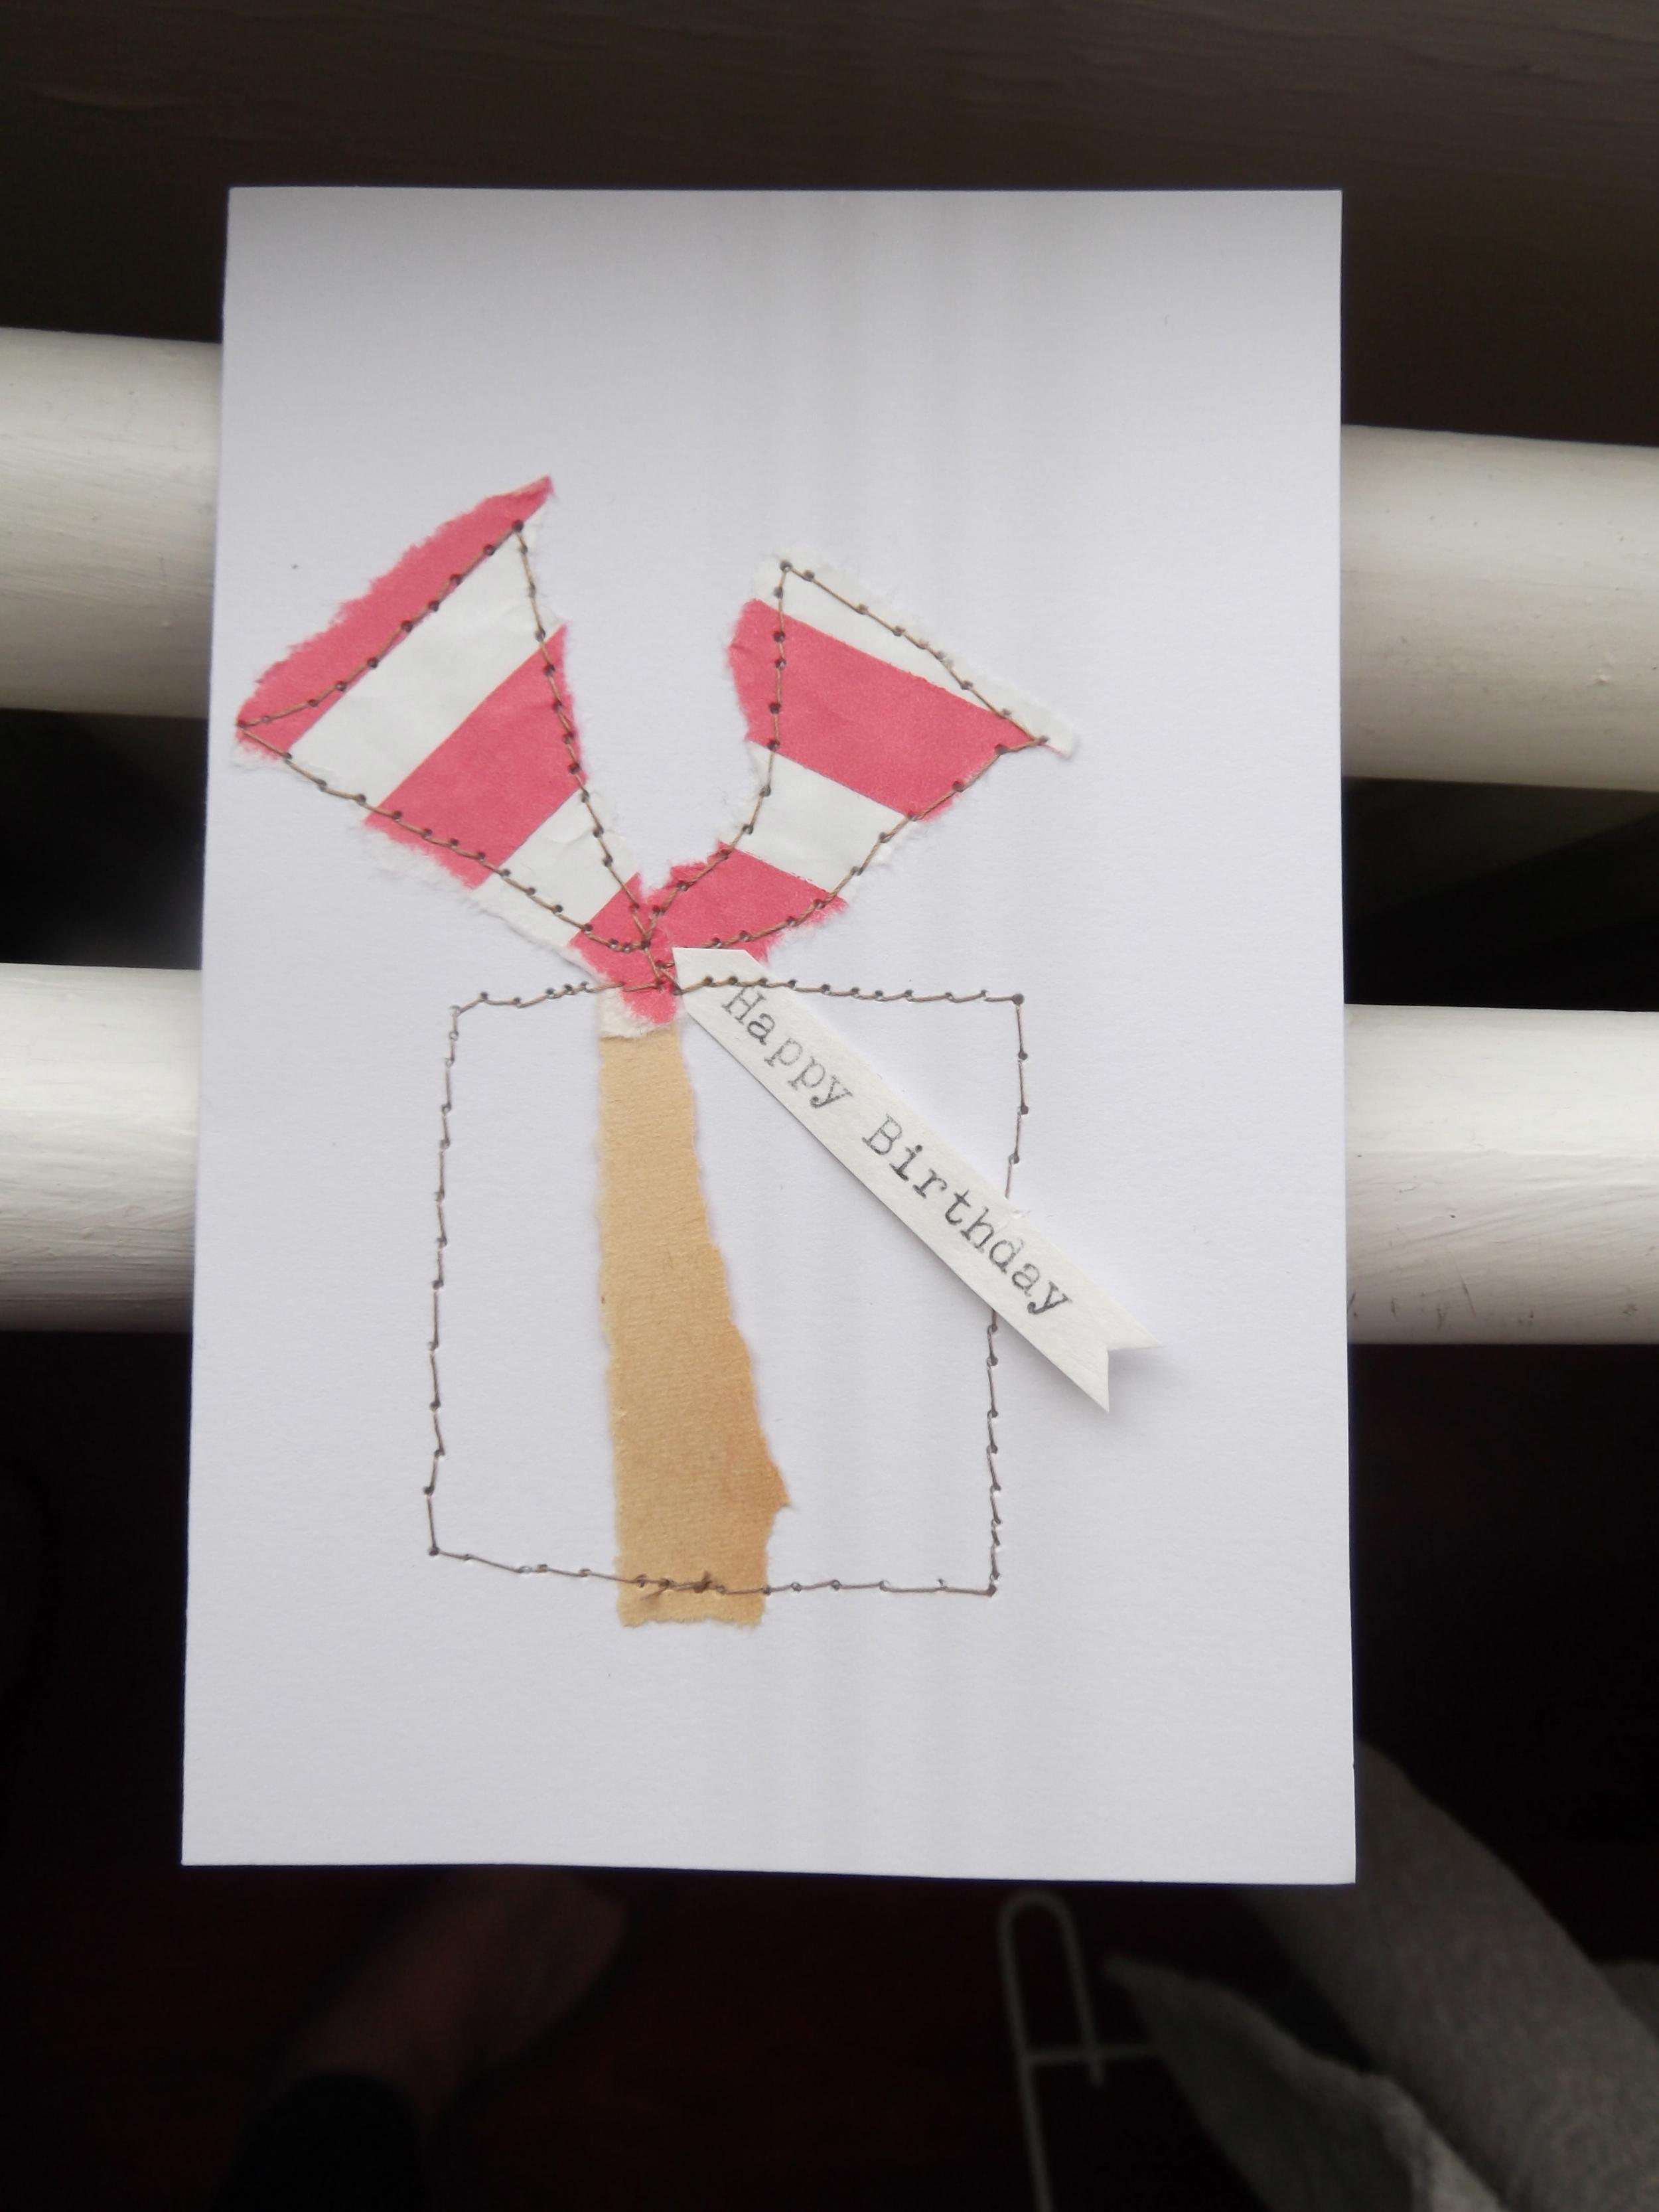 5Birthday_Card_personalised_bespoke_design_and _message.JPG